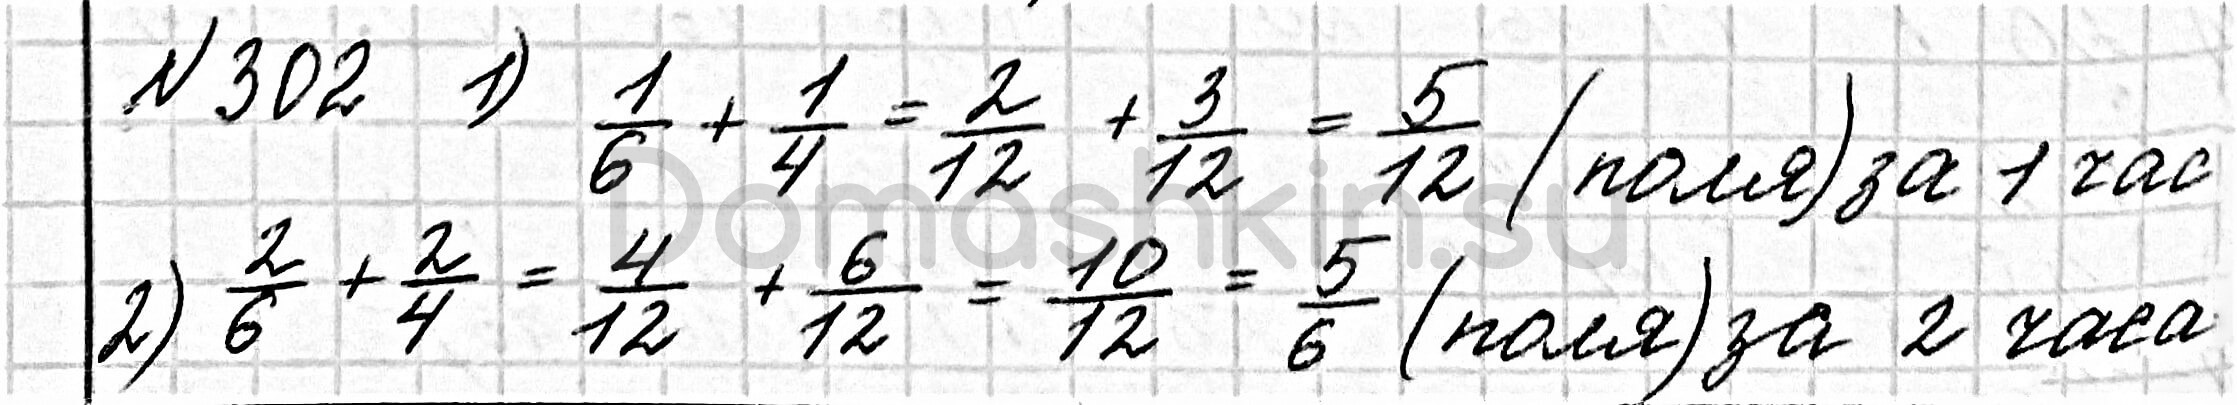 Математика 6 класс учебник Мерзляк номер 302 решение